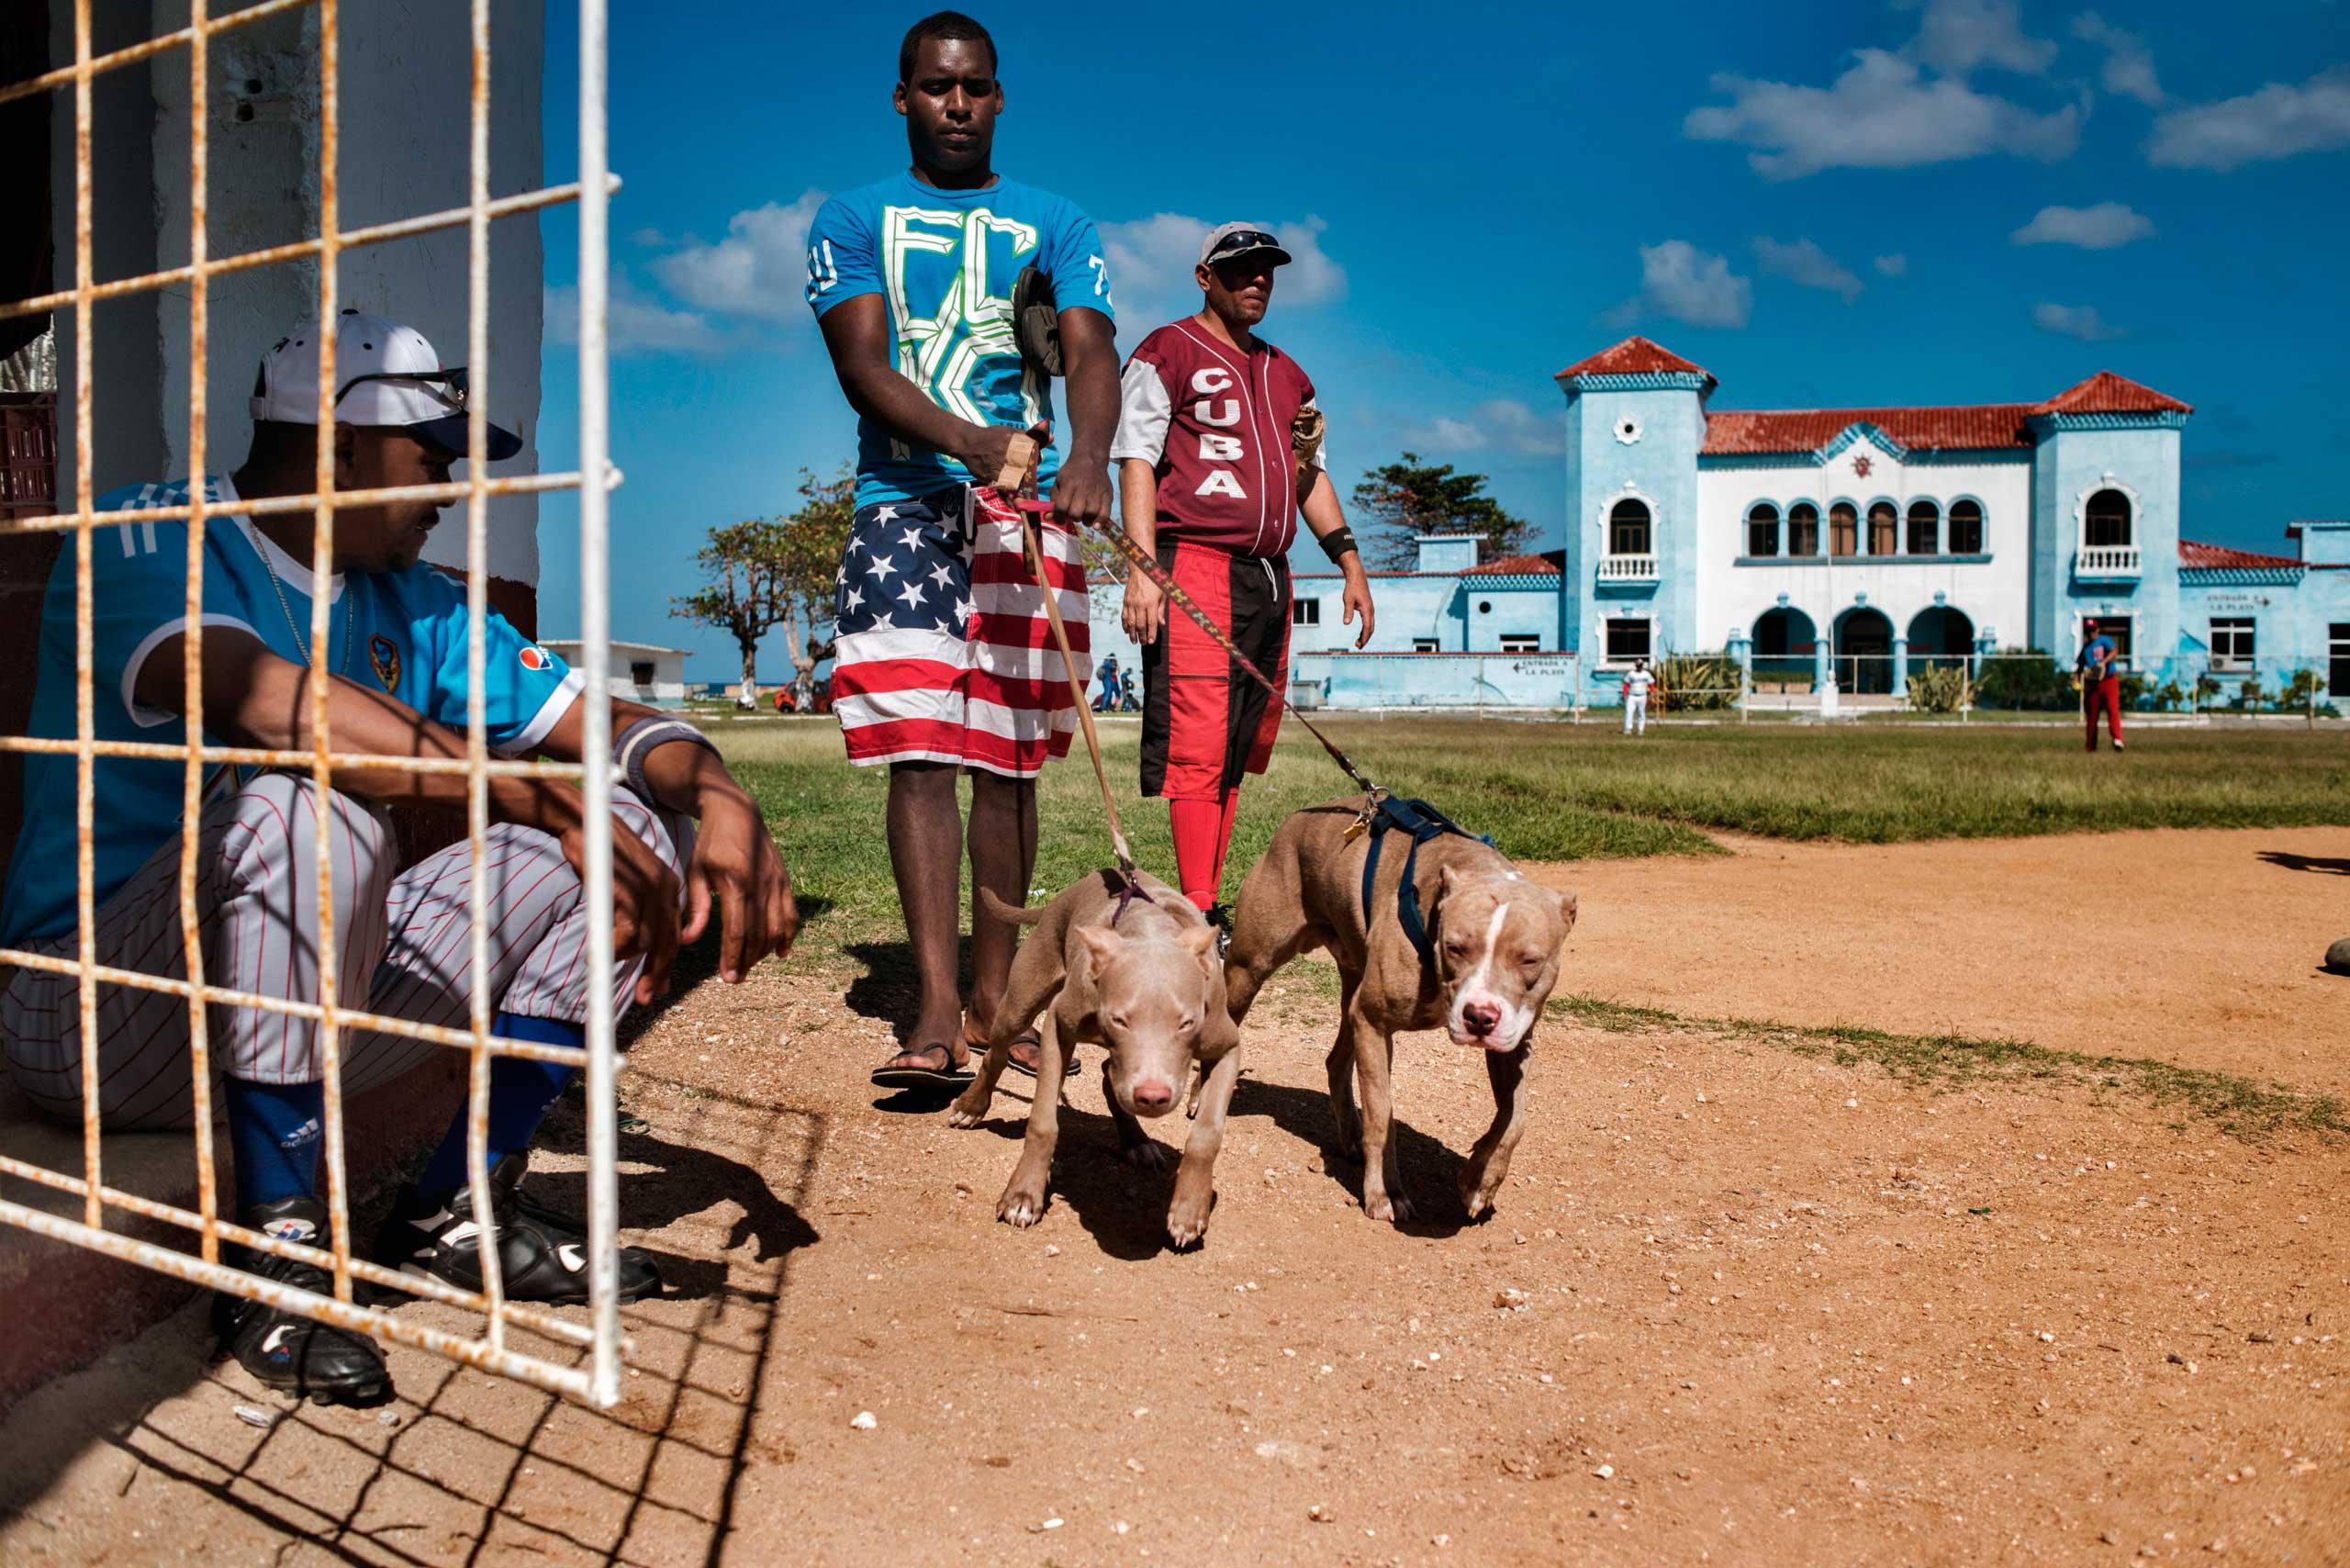 Man wears shorts with the colors of the U.S. flag in Jaimanitas, Cuba, Jan. 2015.